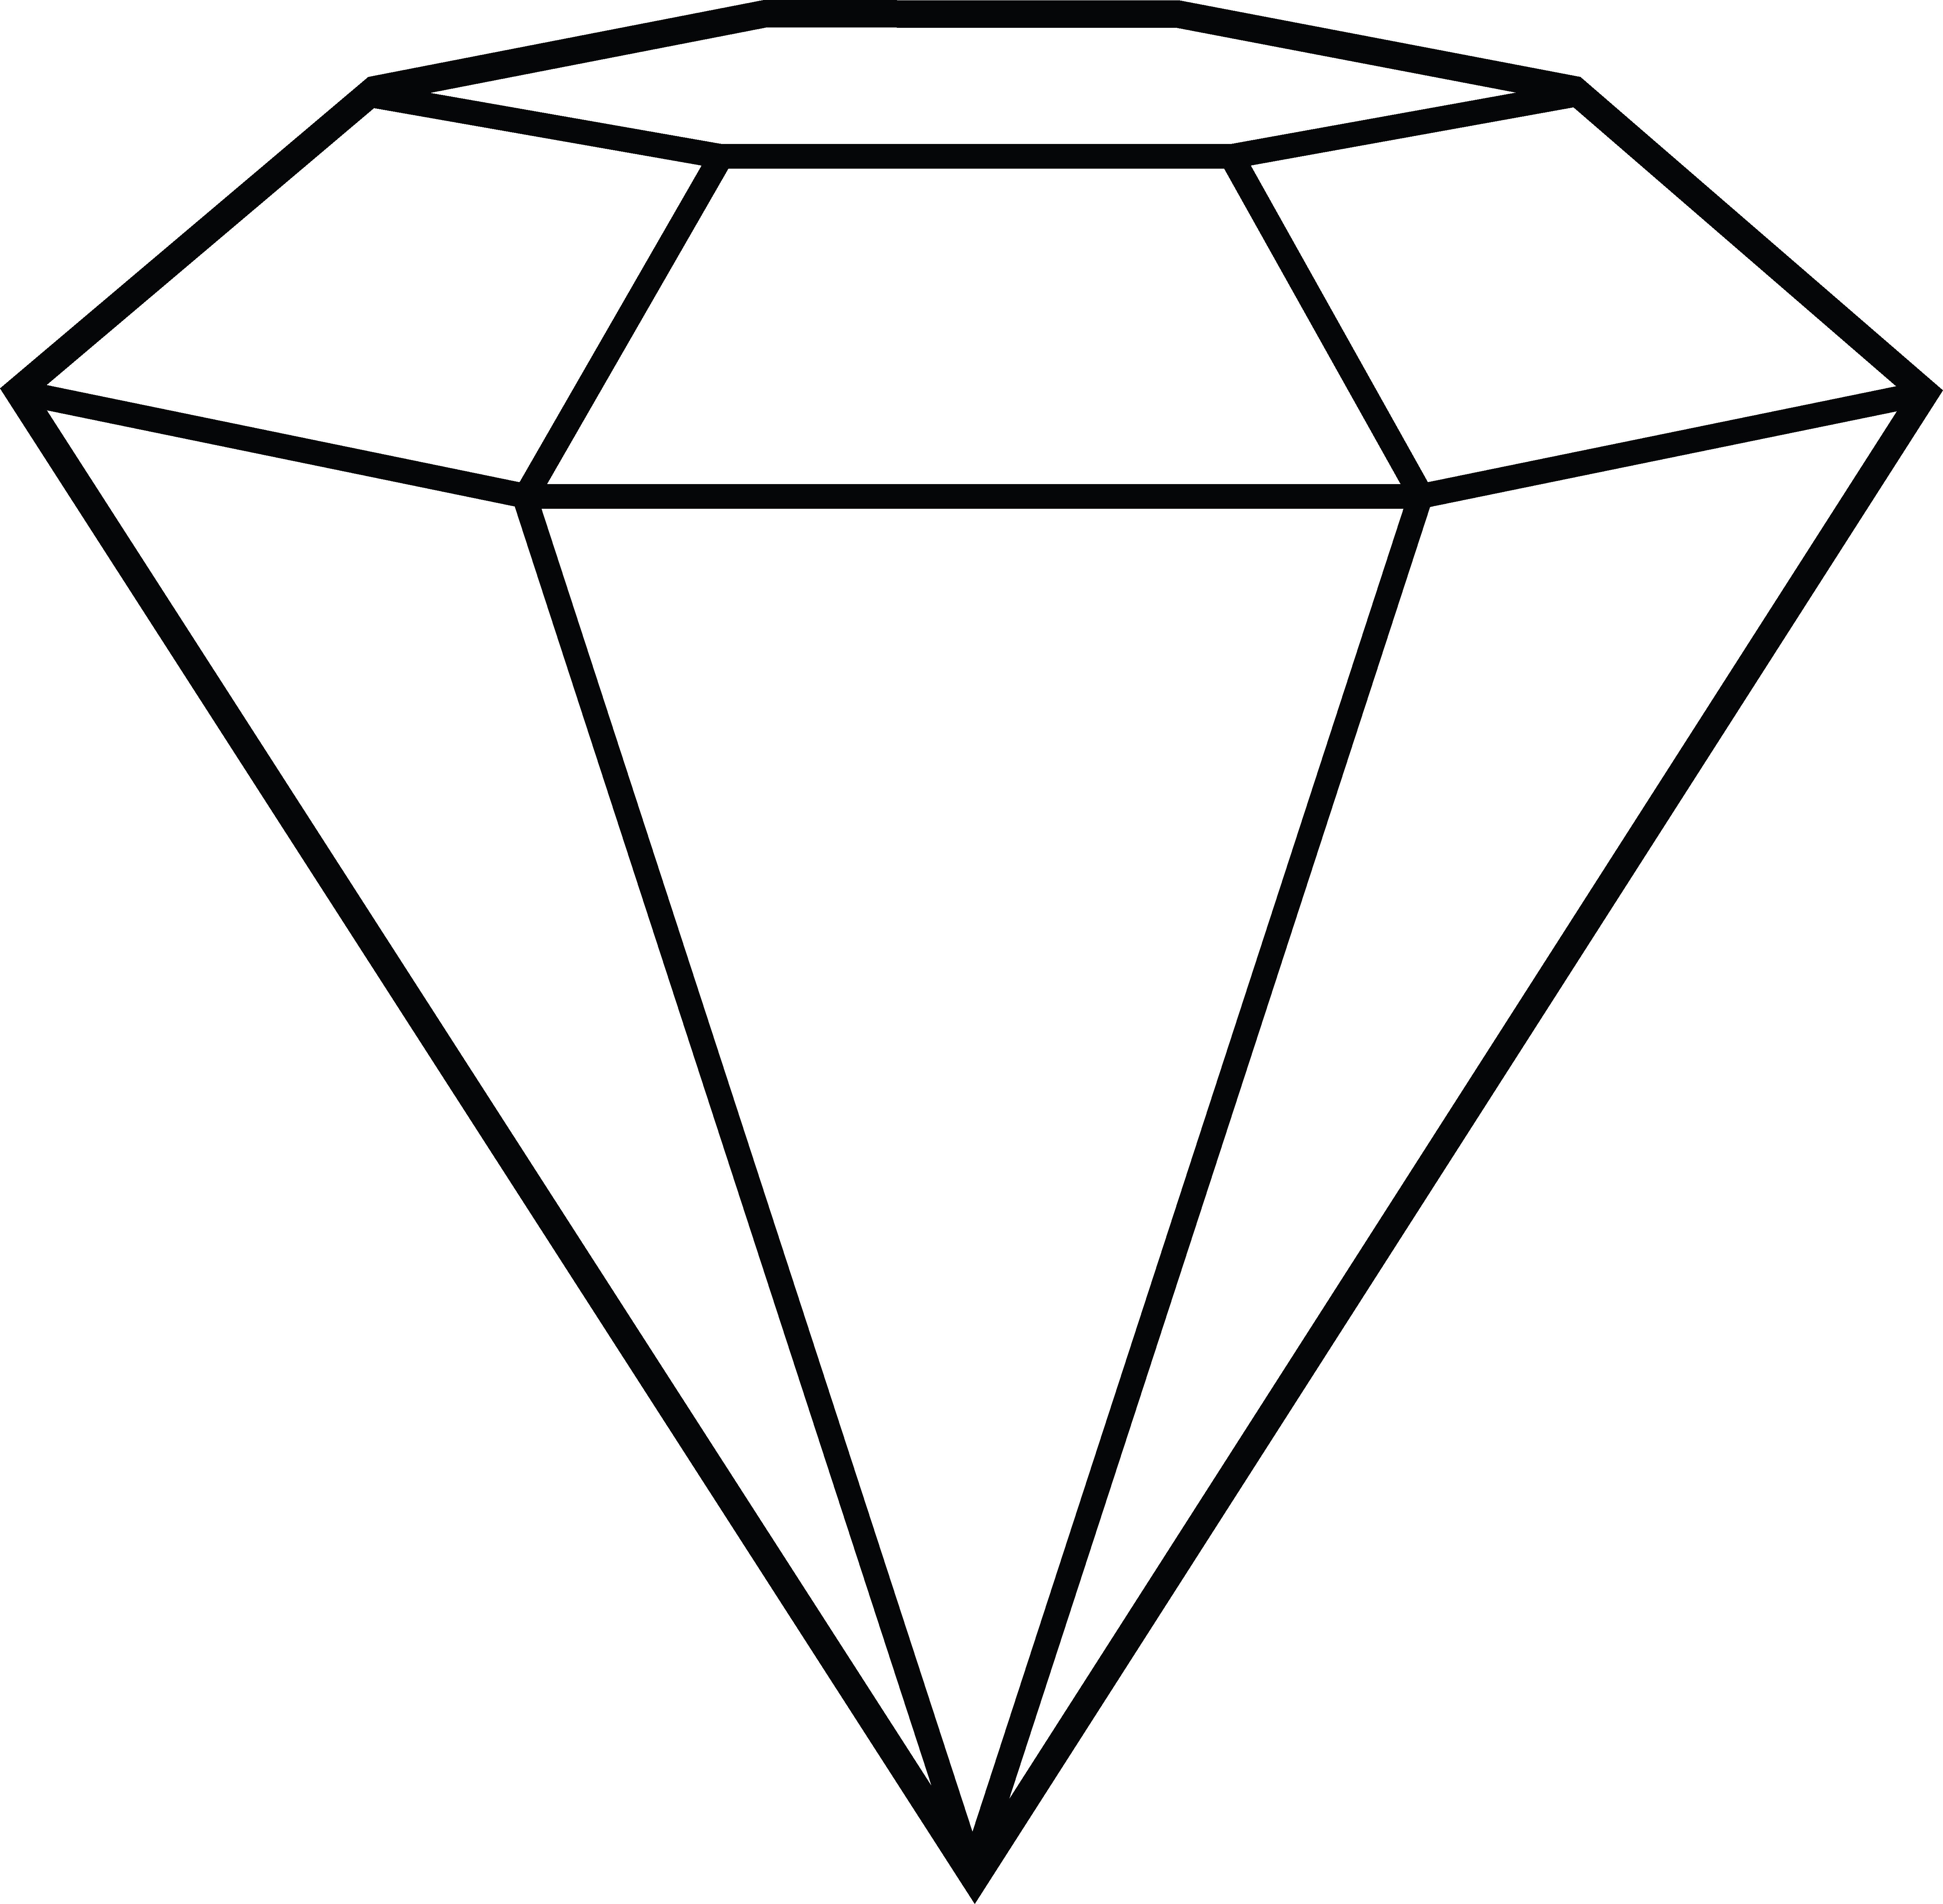 Diamon drawing at getdrawings. Clipart diamond shiny diamond